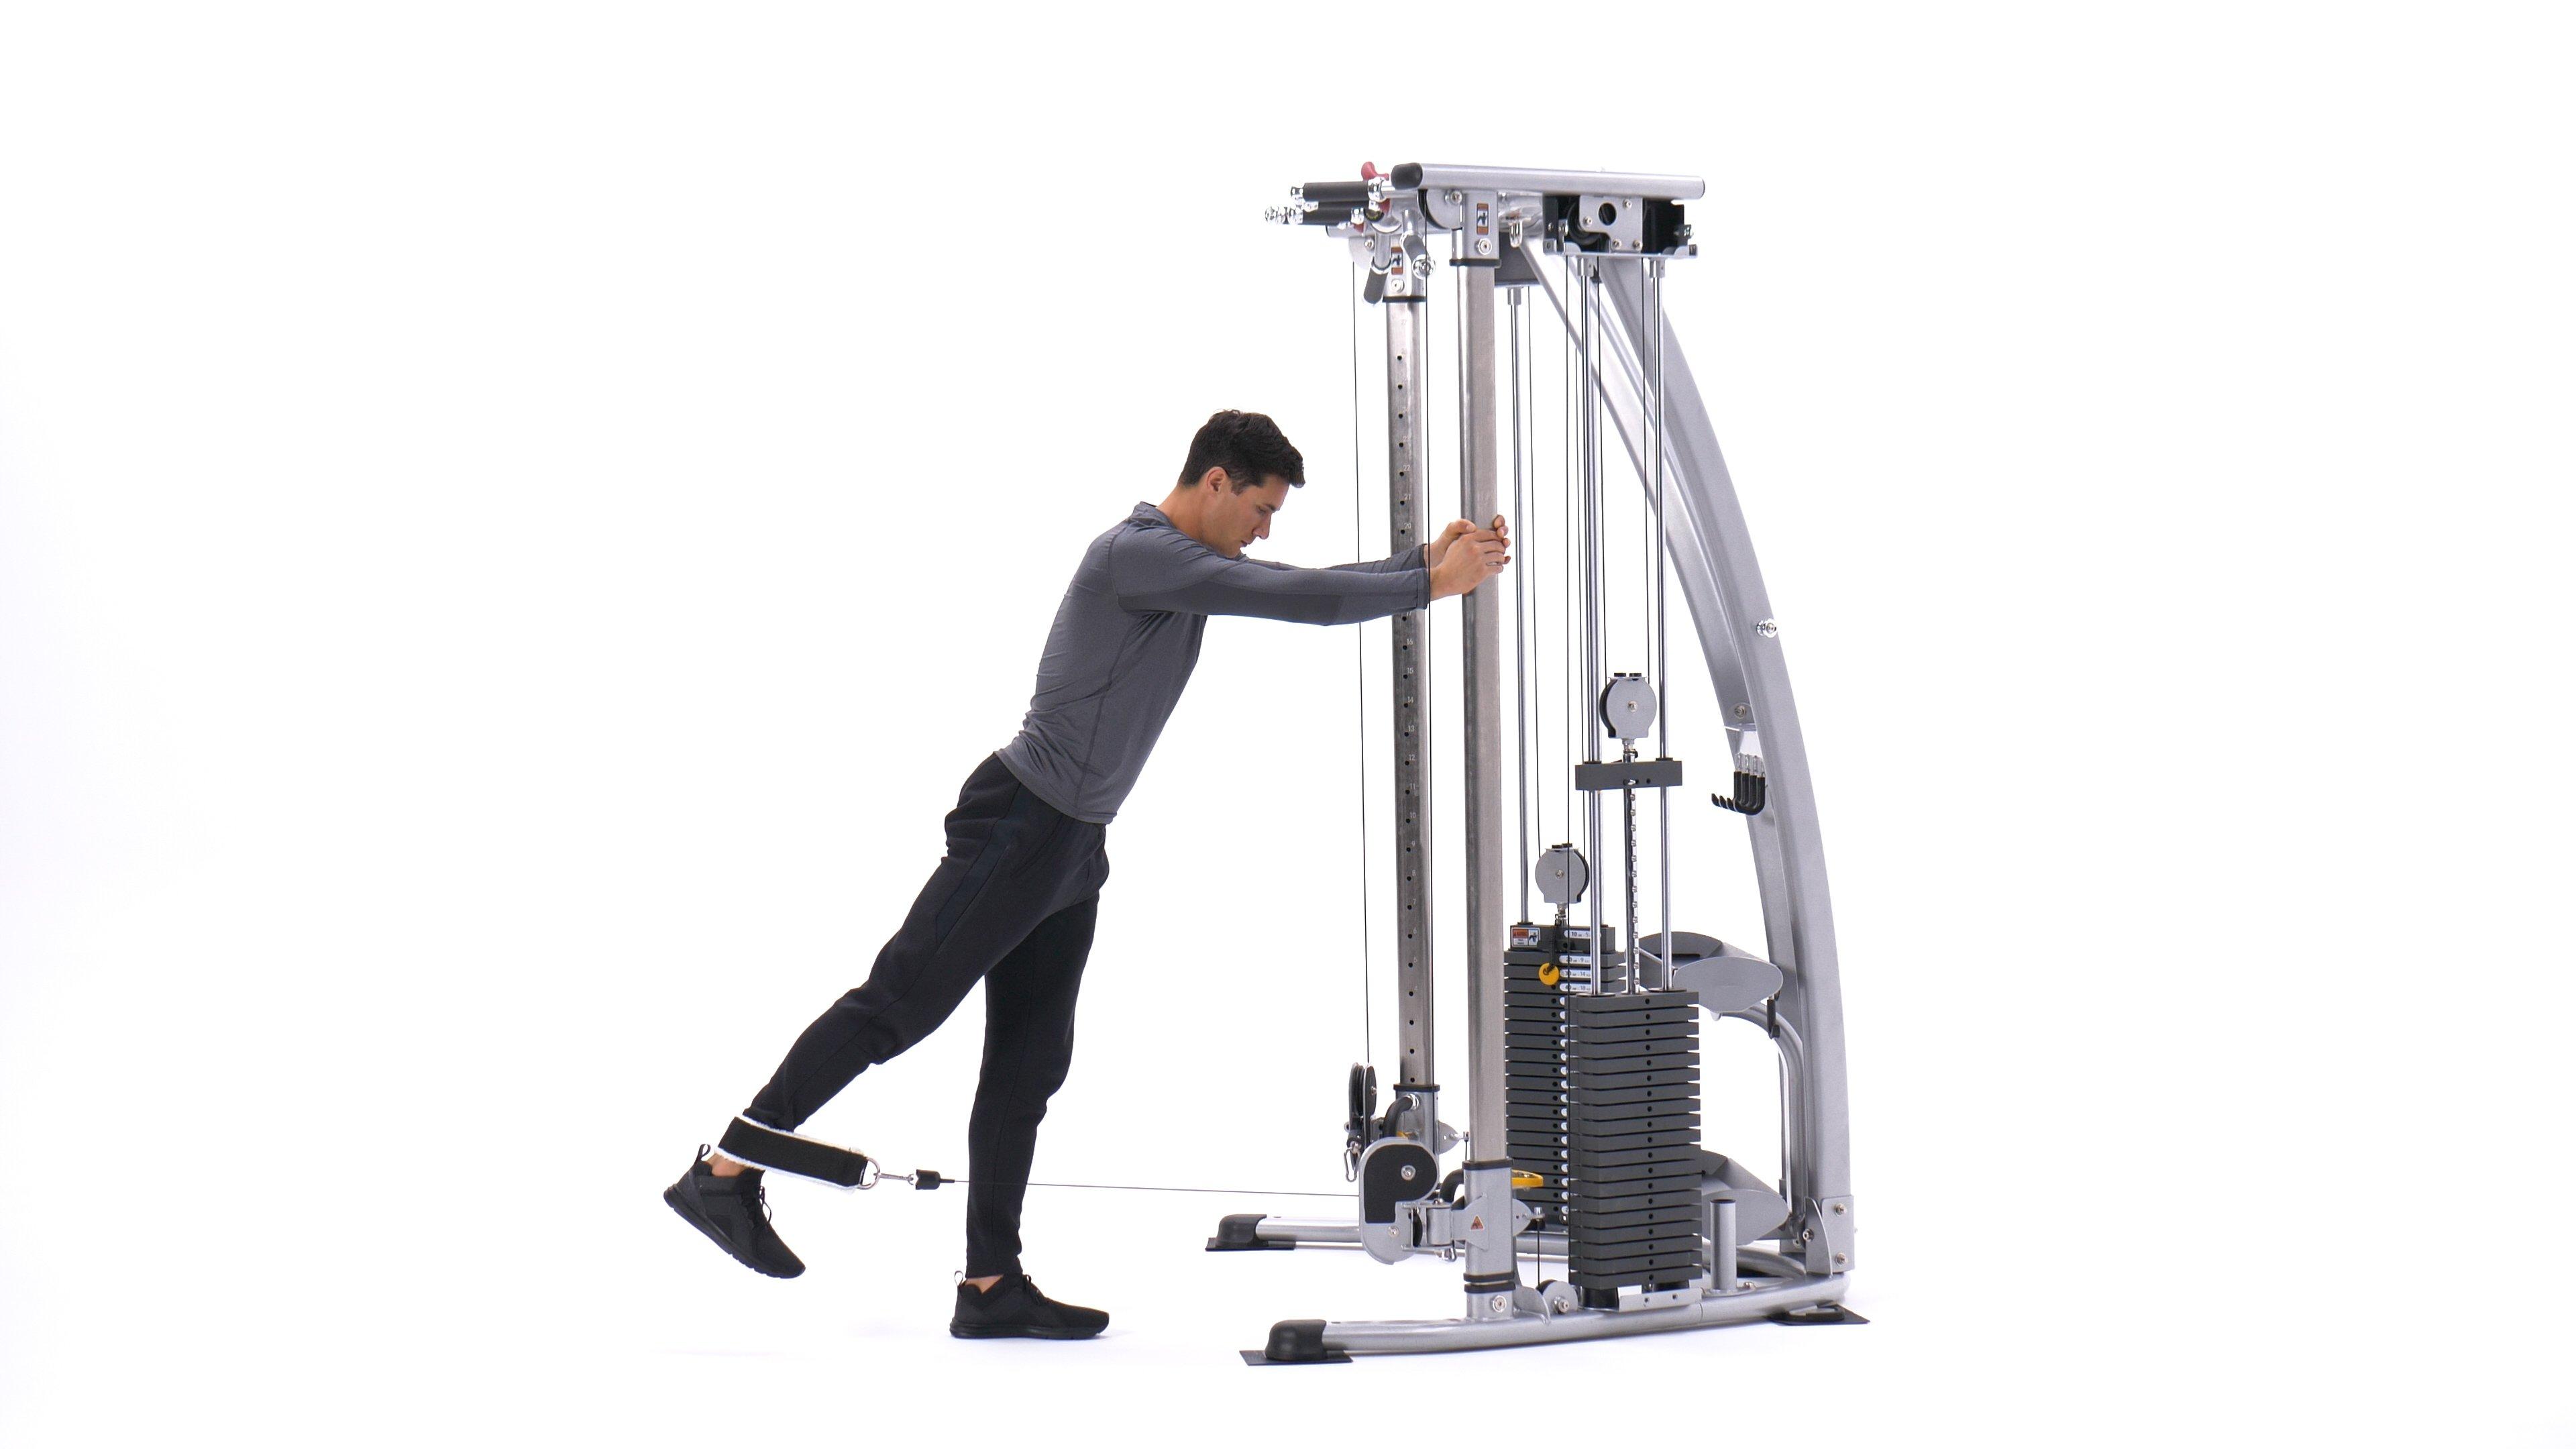 Single-leg cable hip extension image